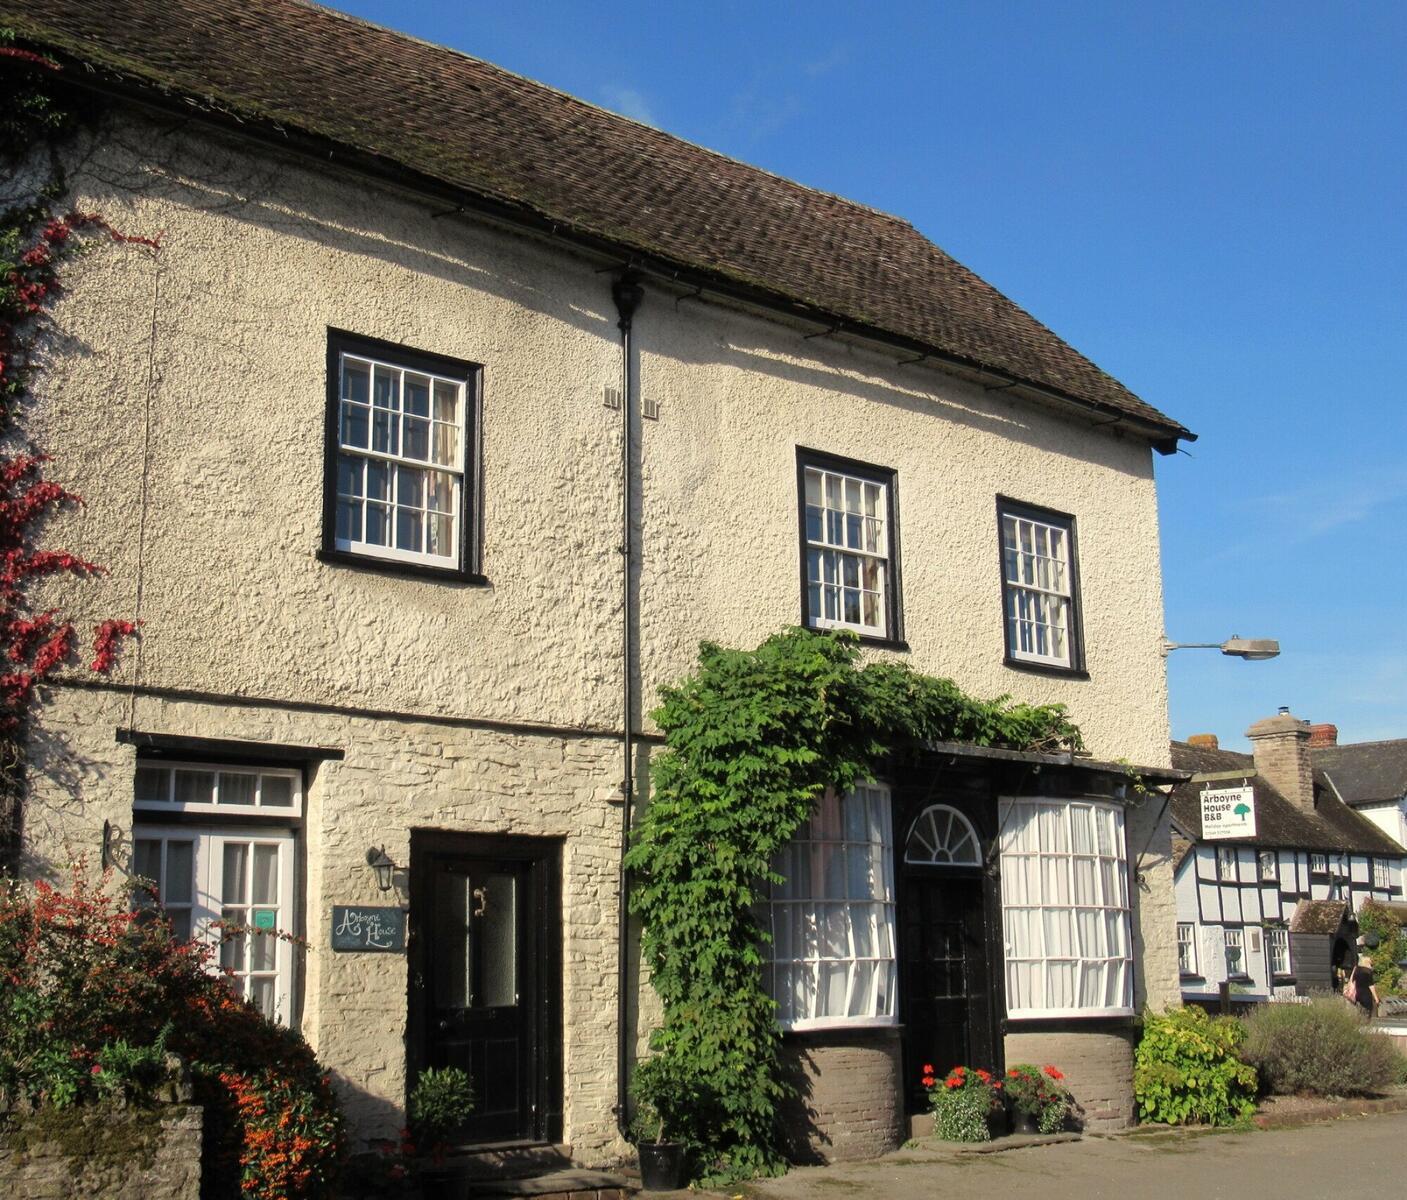 Arboyne House is a listed building and has Georgian shop windows.